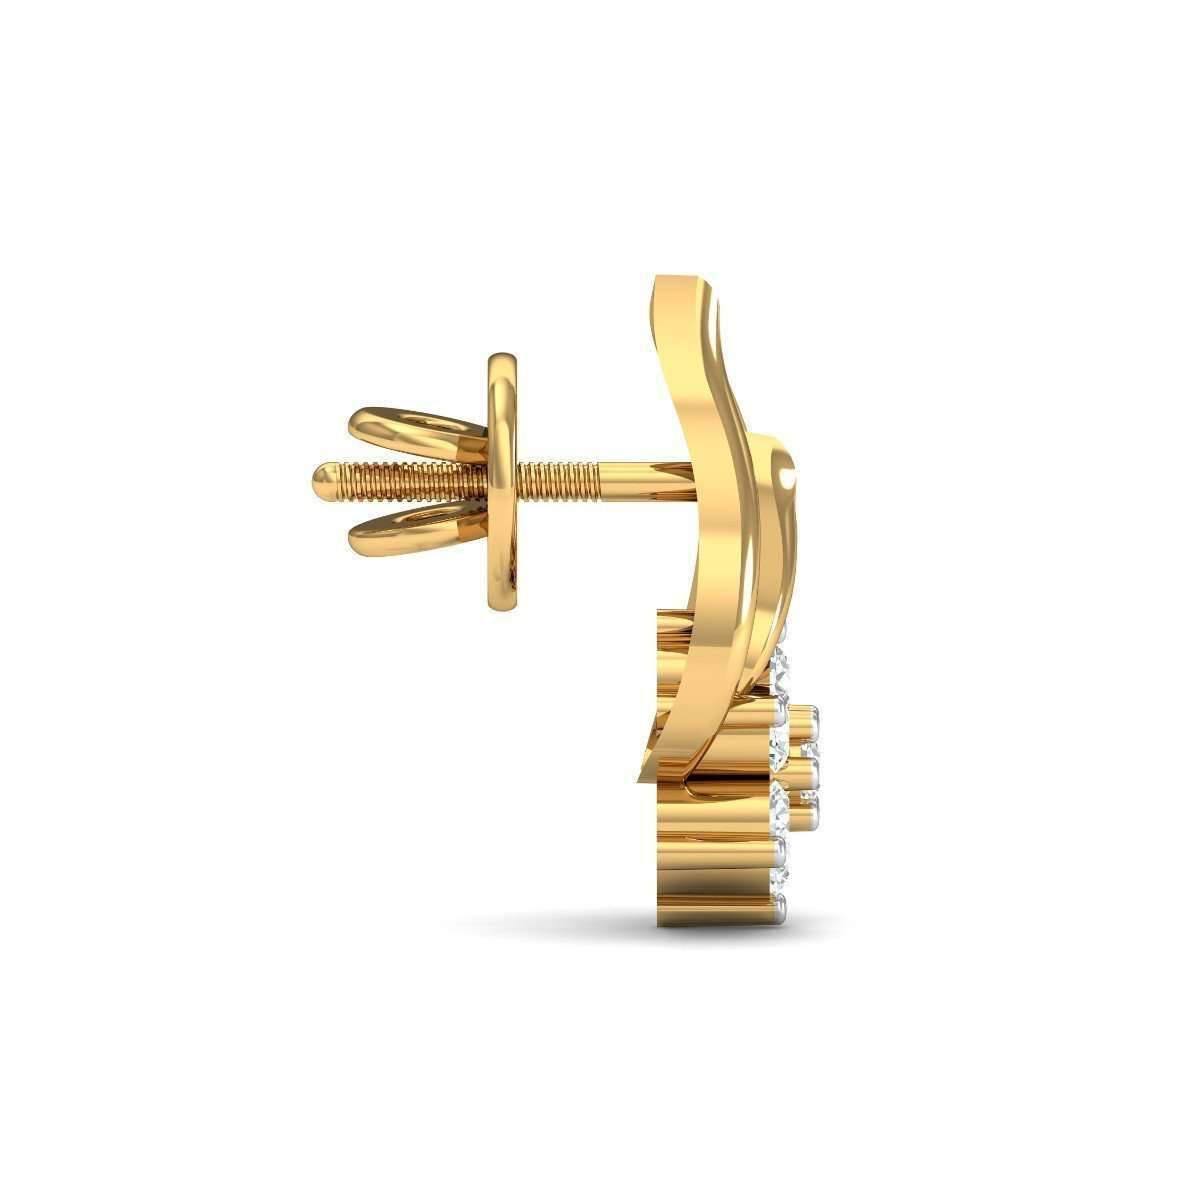 Diamoire Jewels Charming Diamond Stud Earrings in 18kt Yellow Gold bSdS3mkat